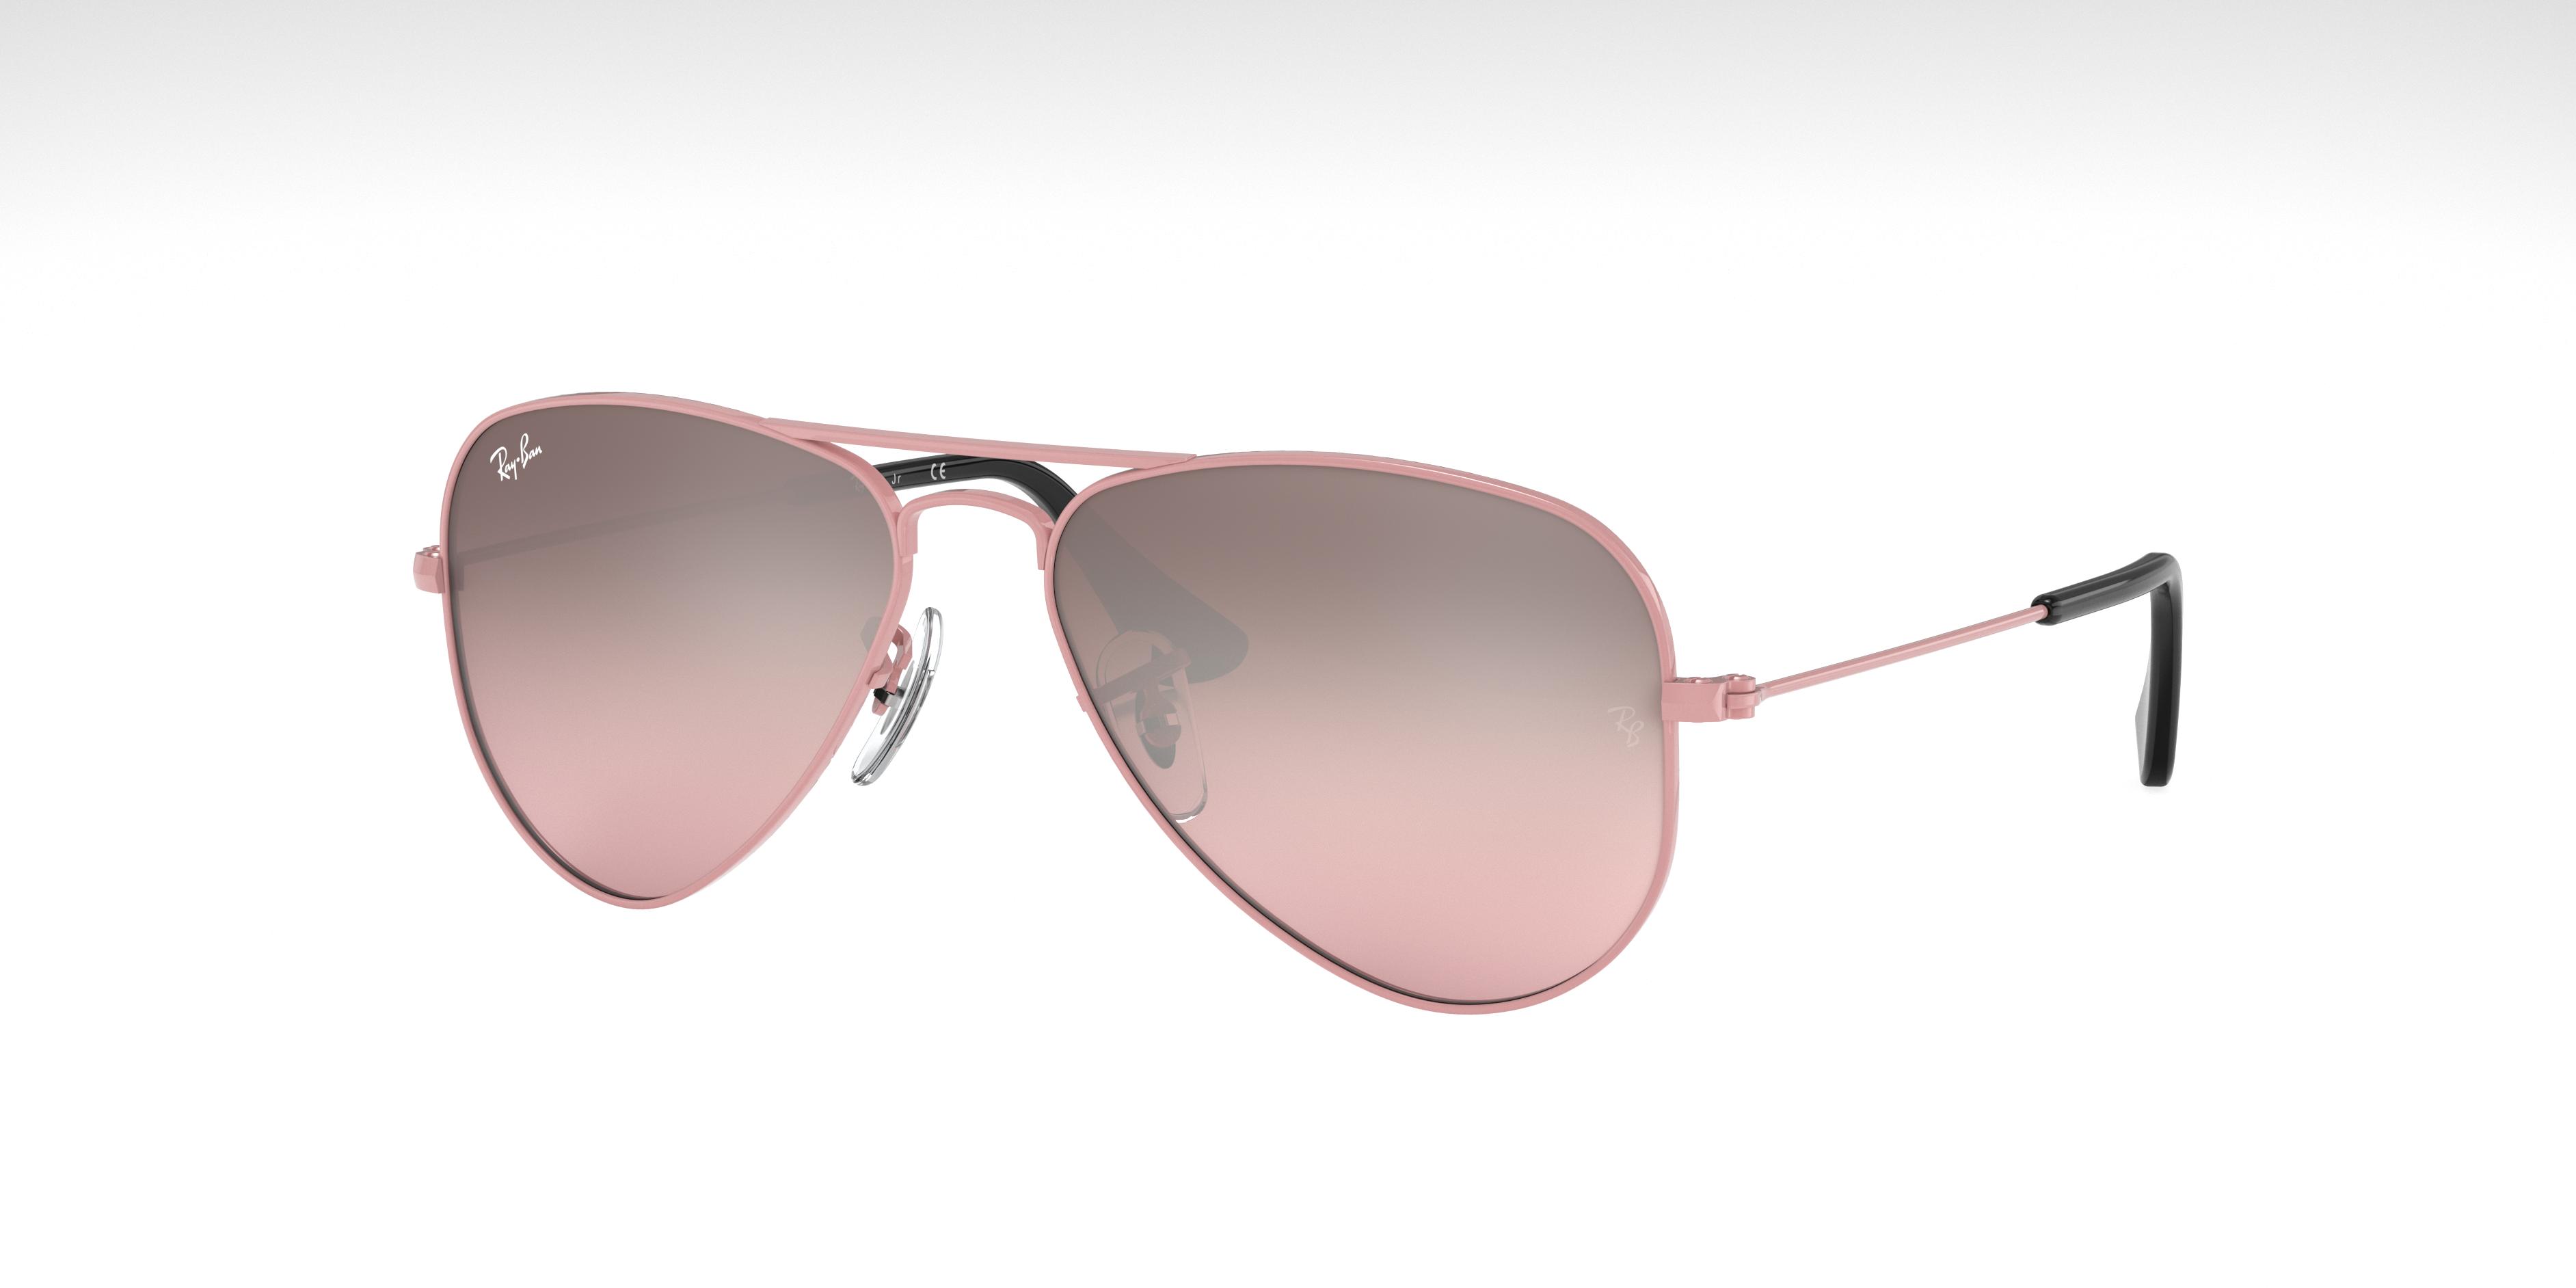 Ray-Ban Aviator Junior Pink, Pink Lenses - RJ9506S